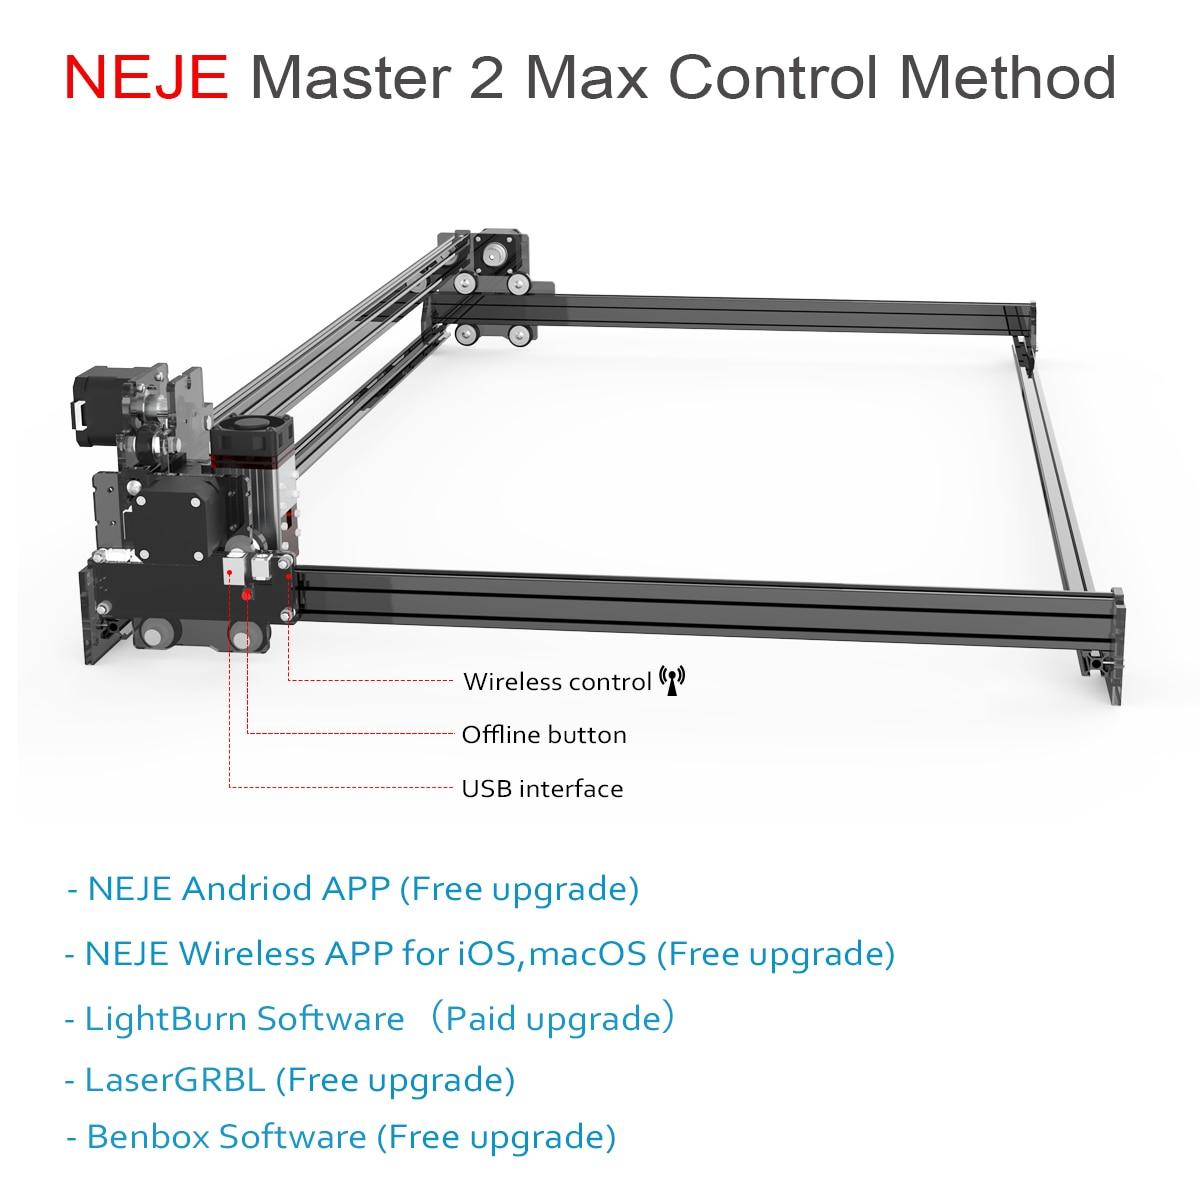 Master 2S Max 80Watt A40640 NEJE CNC Wood Laser Engraver Cutter Cutting Engraving Machine Router Lightburn LaserGRBL App Control enlarge